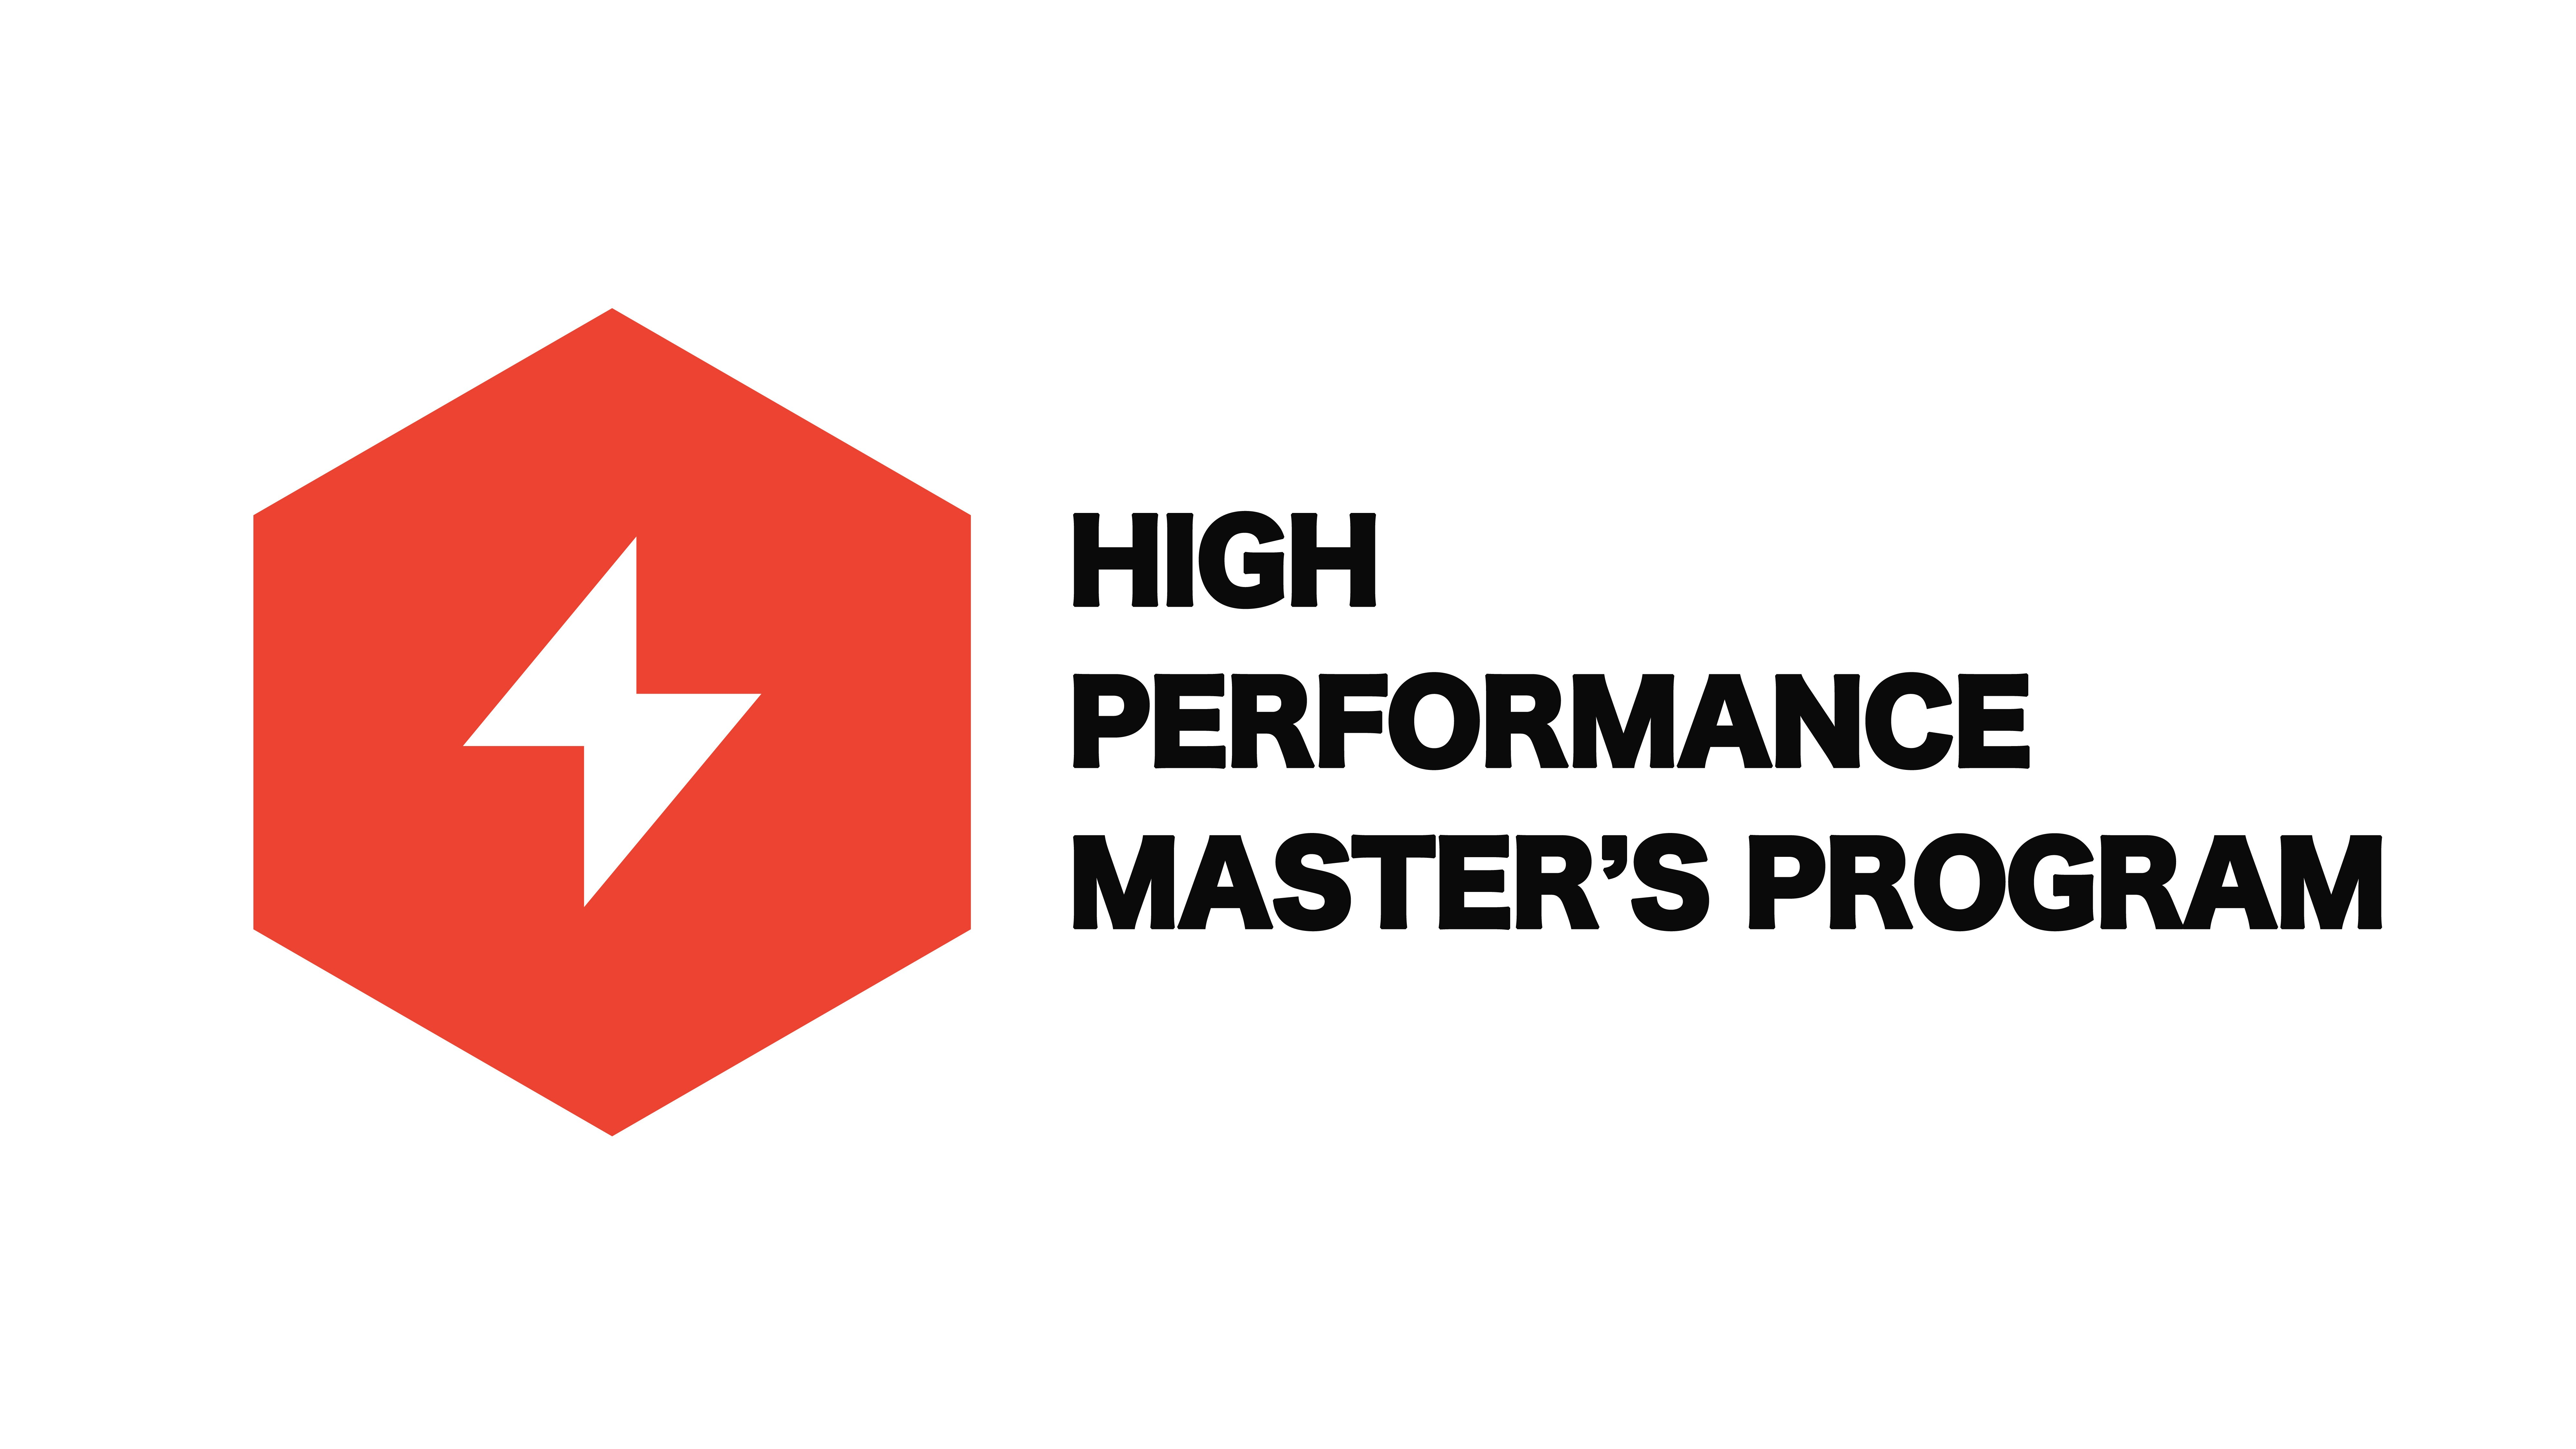 Igv7rtw5rqmmtkjz8x6r hp masters program logo vector